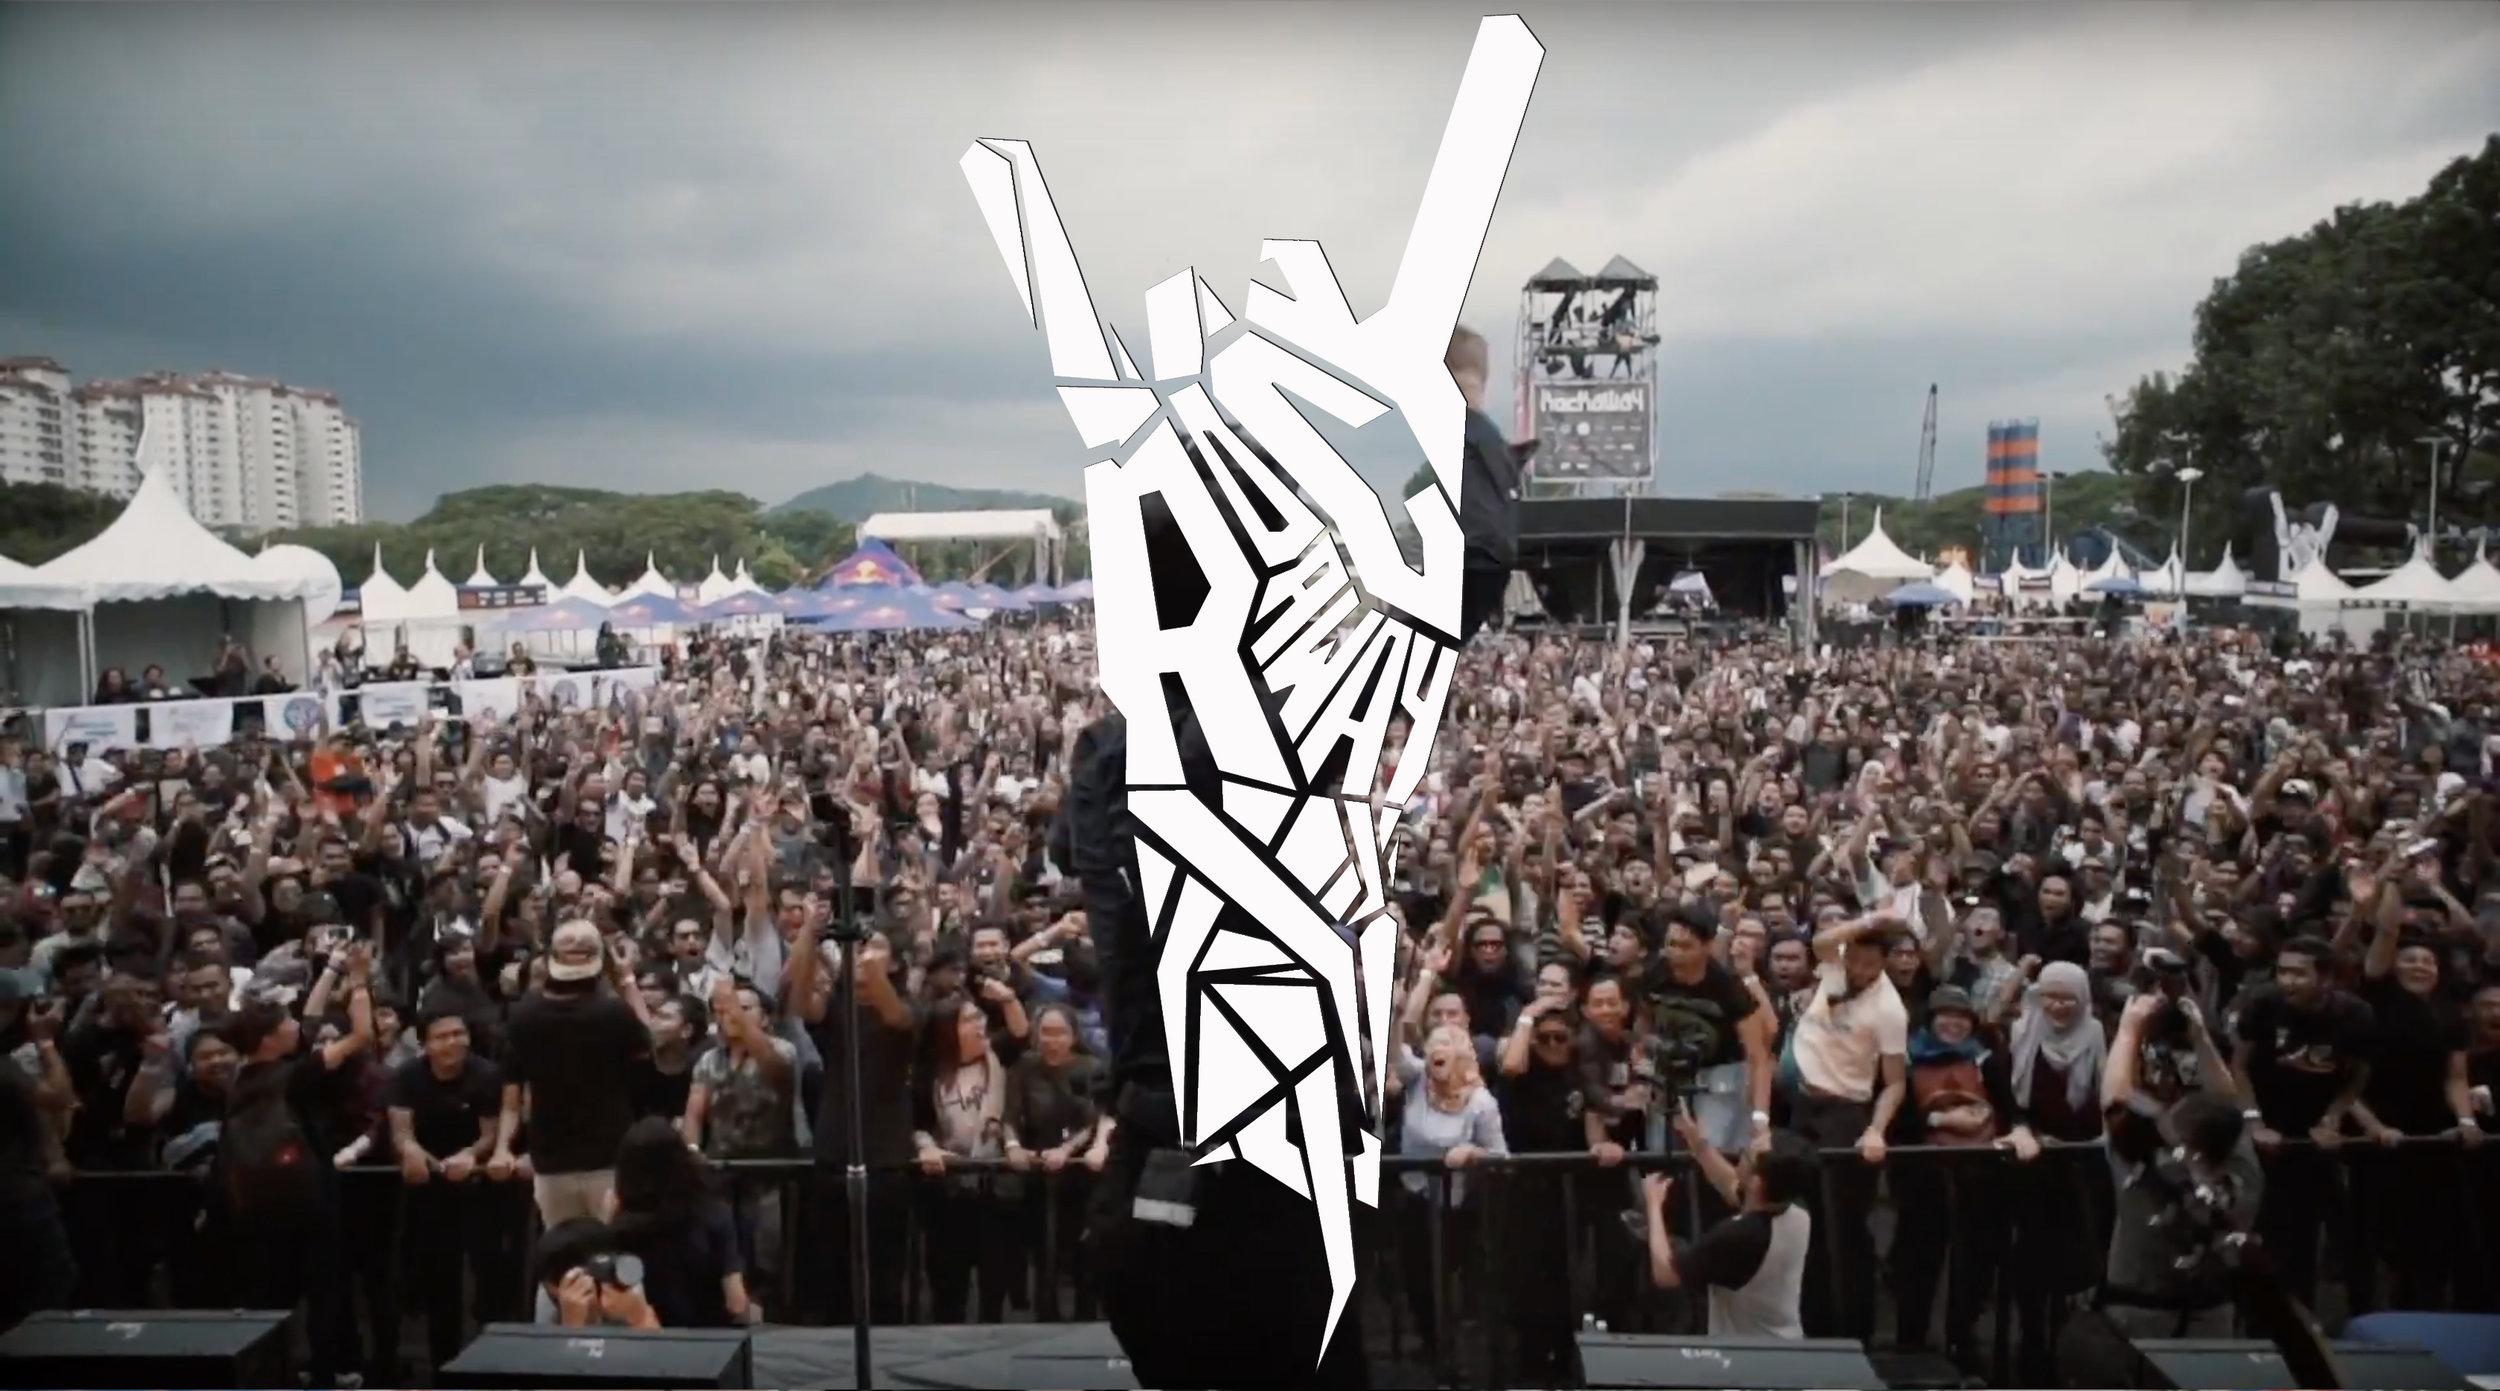 ROCKAWAY FESTIVAL / 2016 / Event